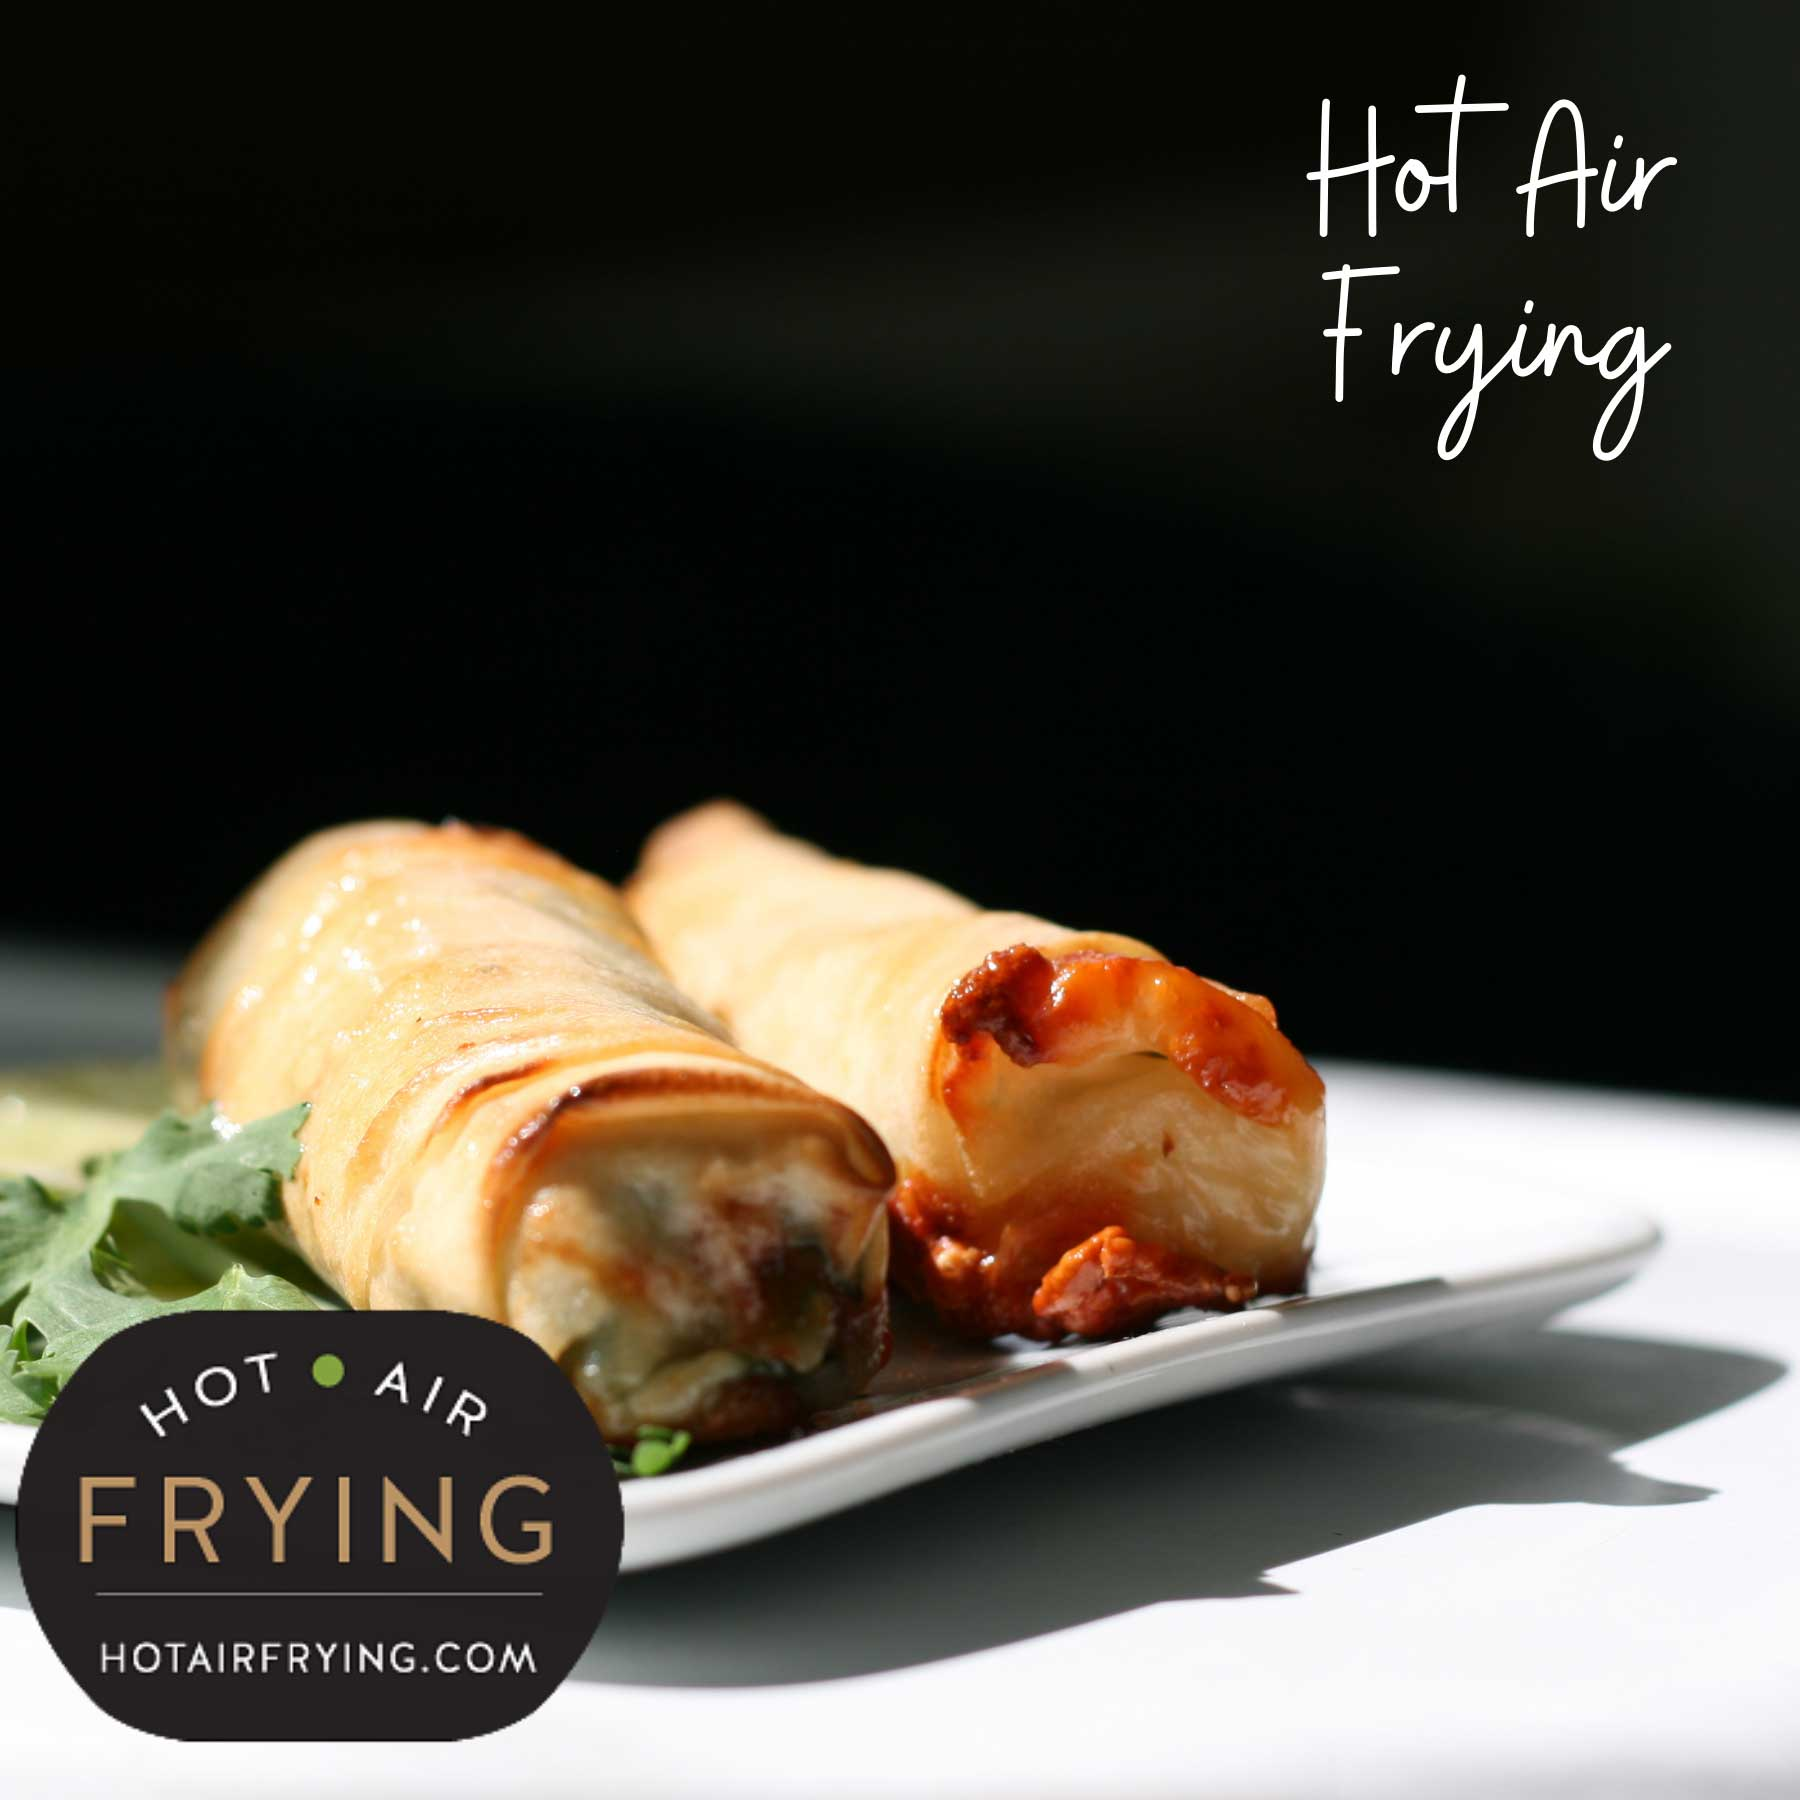 www.hotairfrying.com